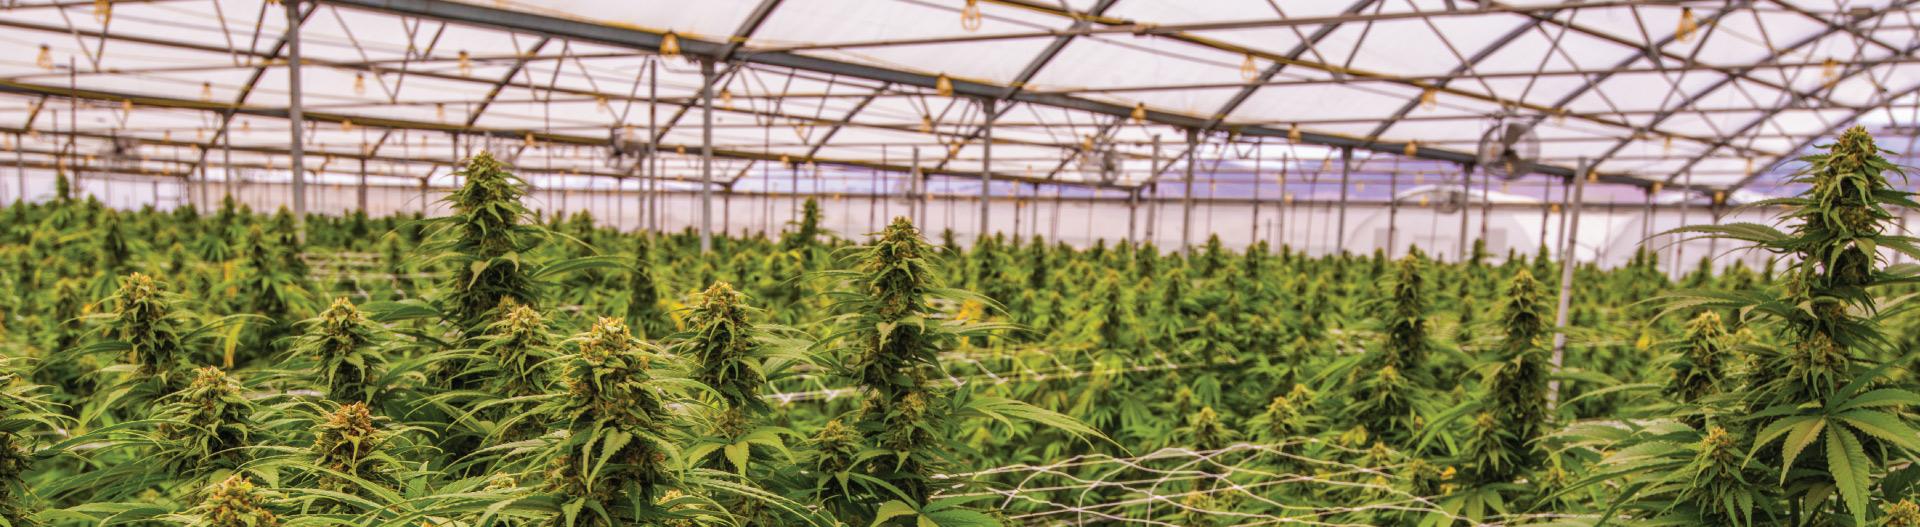 Cannabis Plant Field